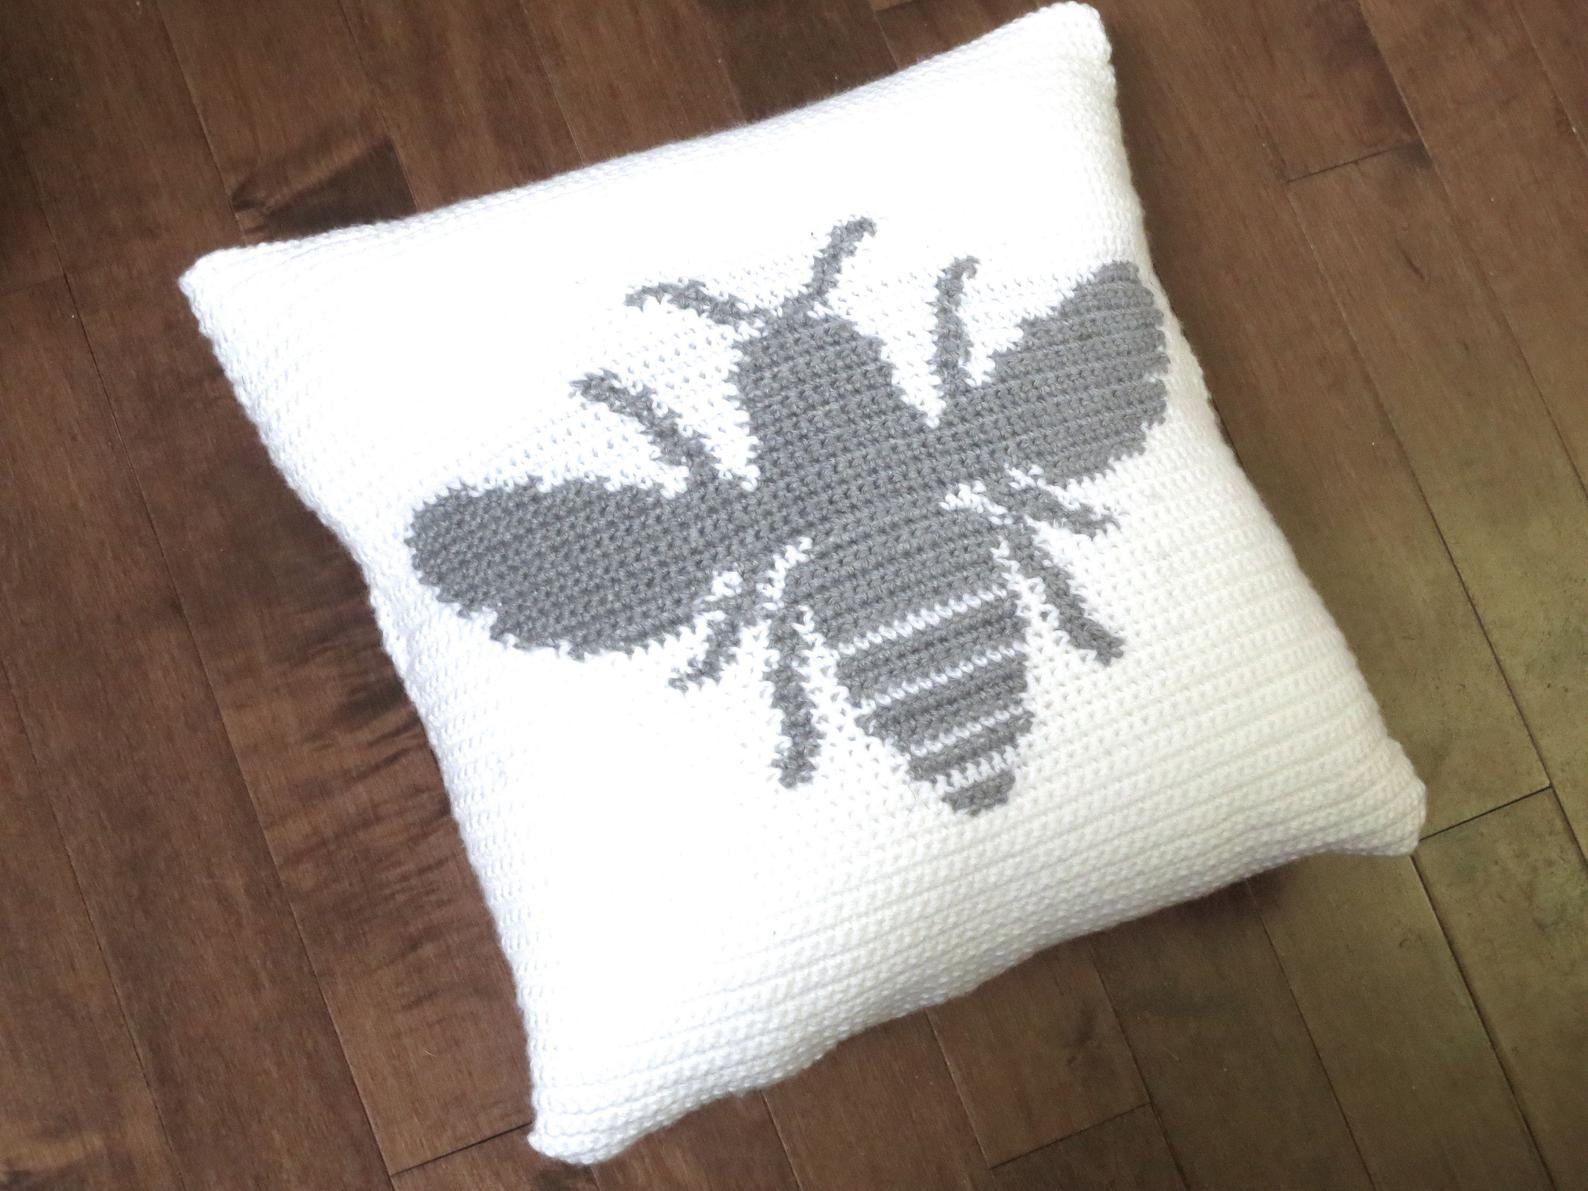 Crochet Pattern Bumble Bee Pillow Crochet Pillow DIY Decoration Farmhouse Style Home Decor Boho Easter Decor Bee Crochet Cushion Pattern